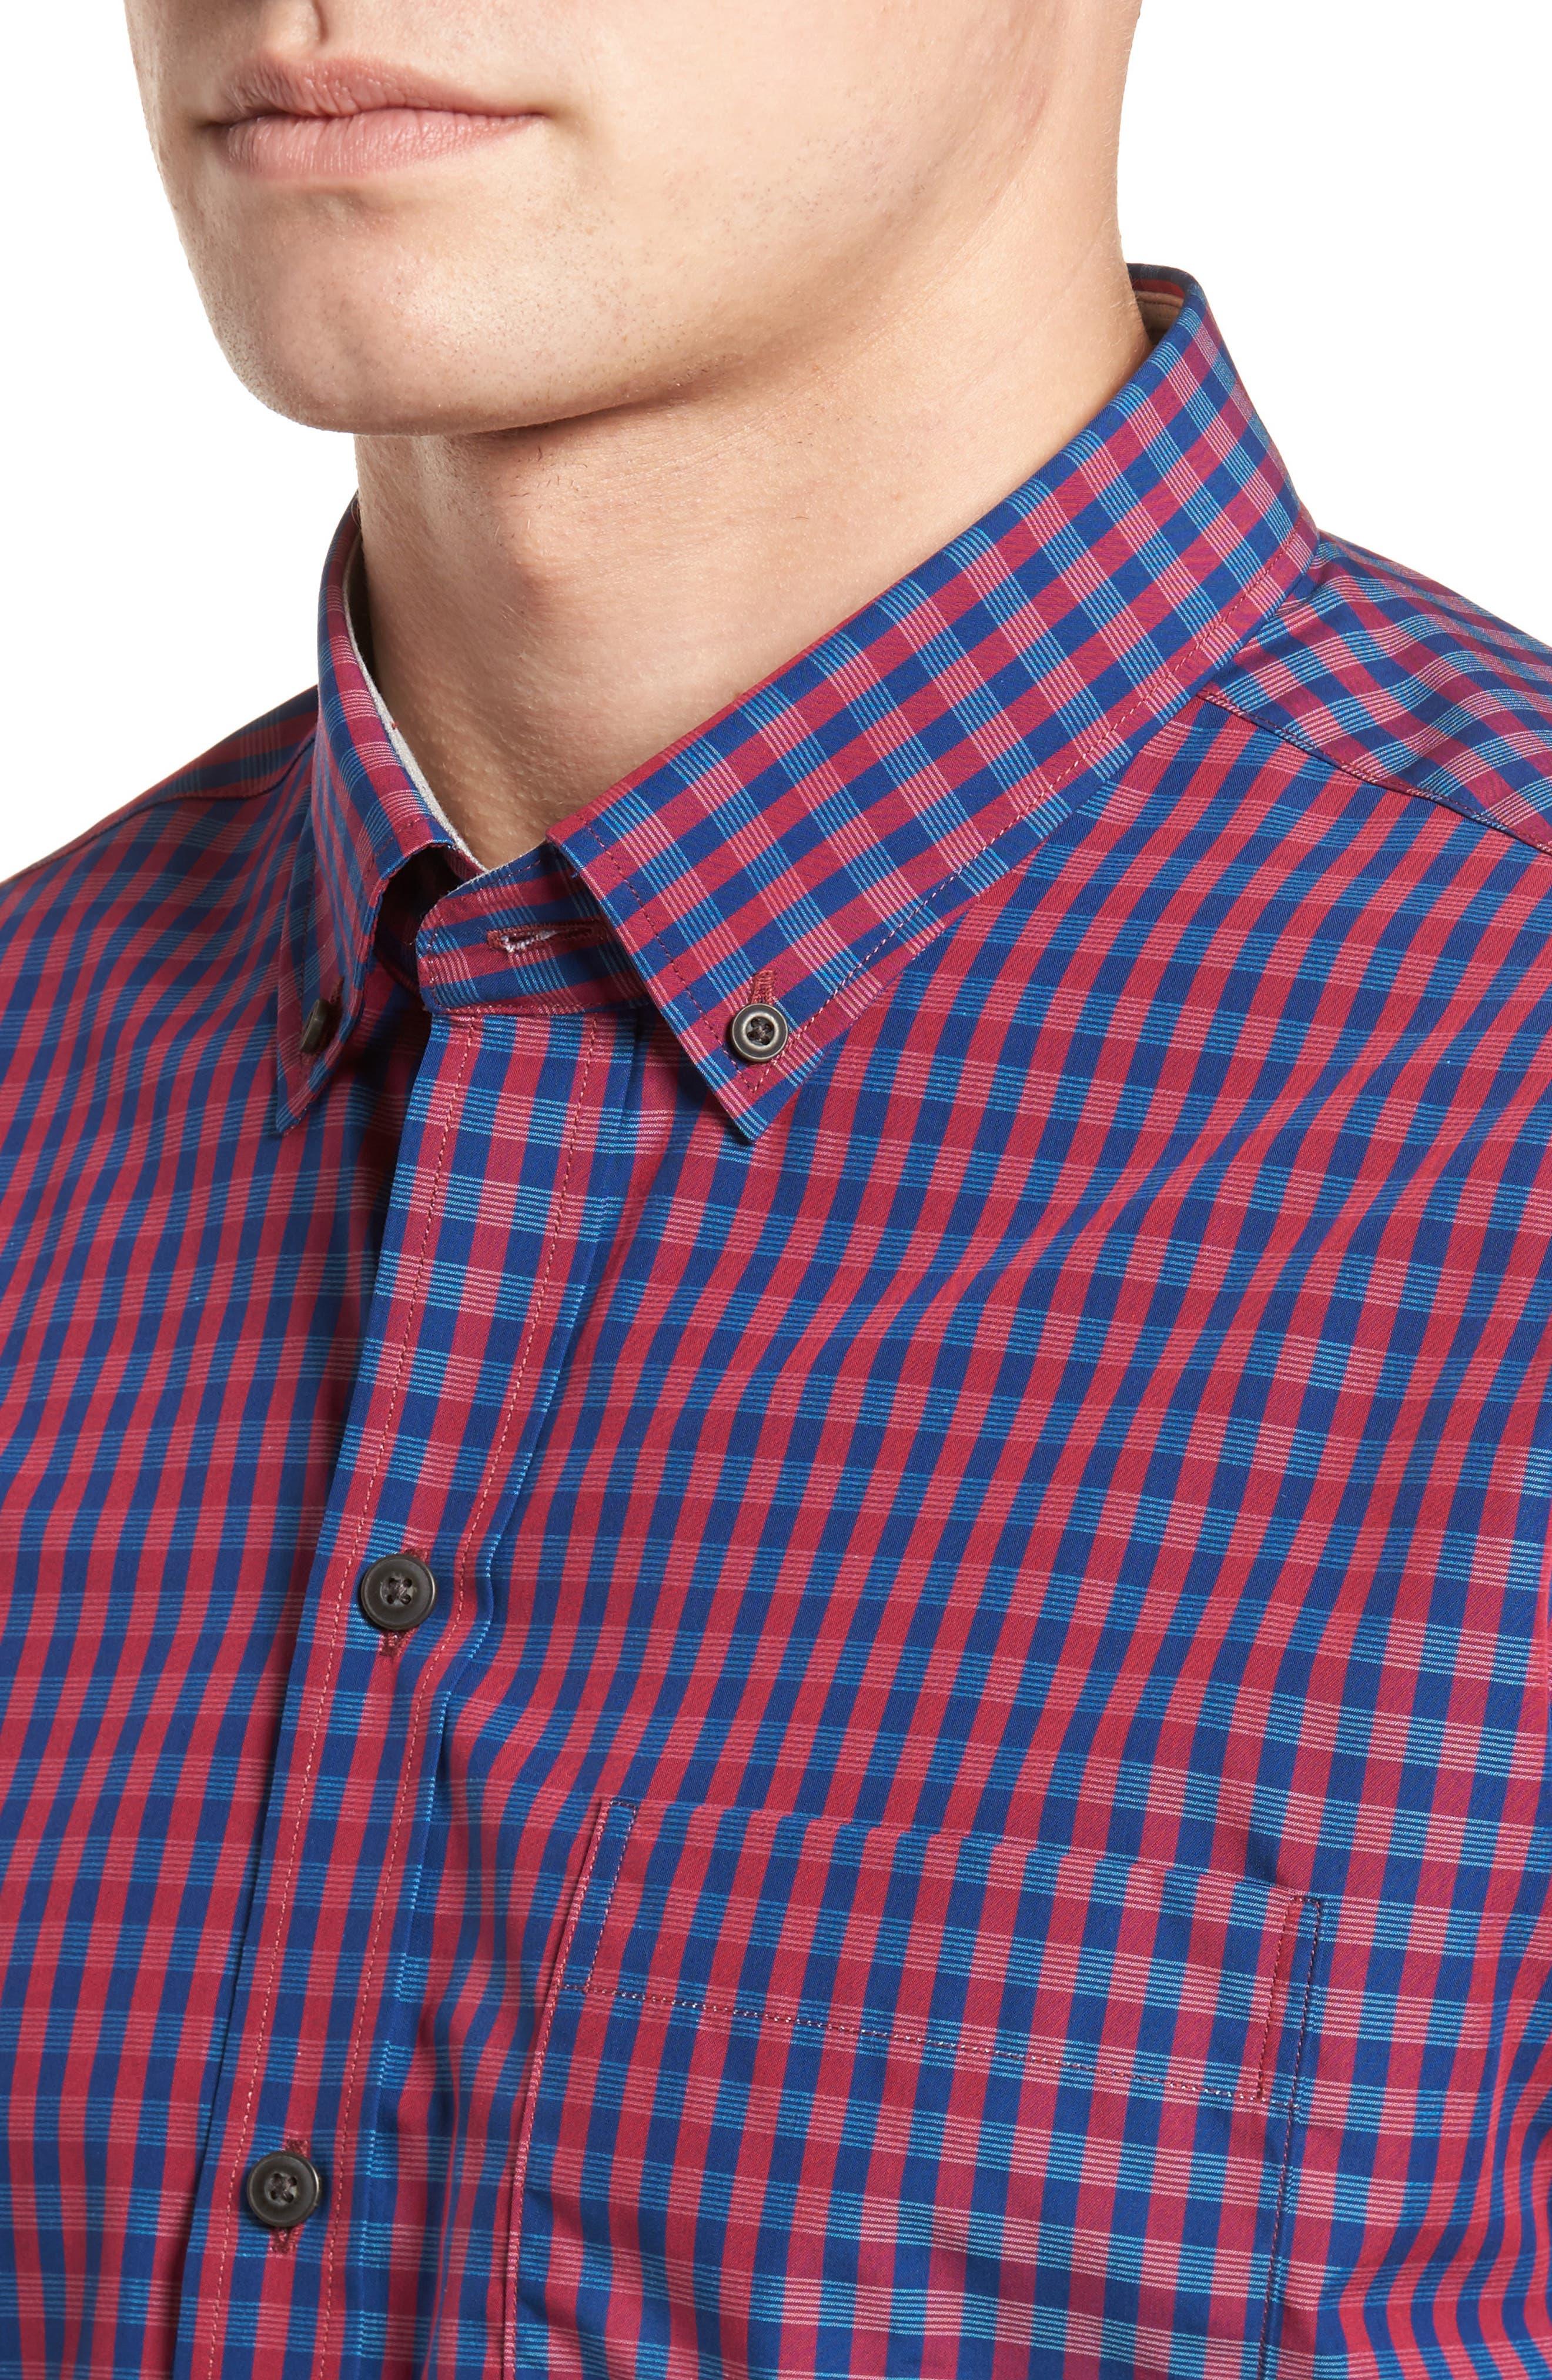 Myles Non-Iron Check Sport Shirt,                             Alternate thumbnail 4, color,                             691